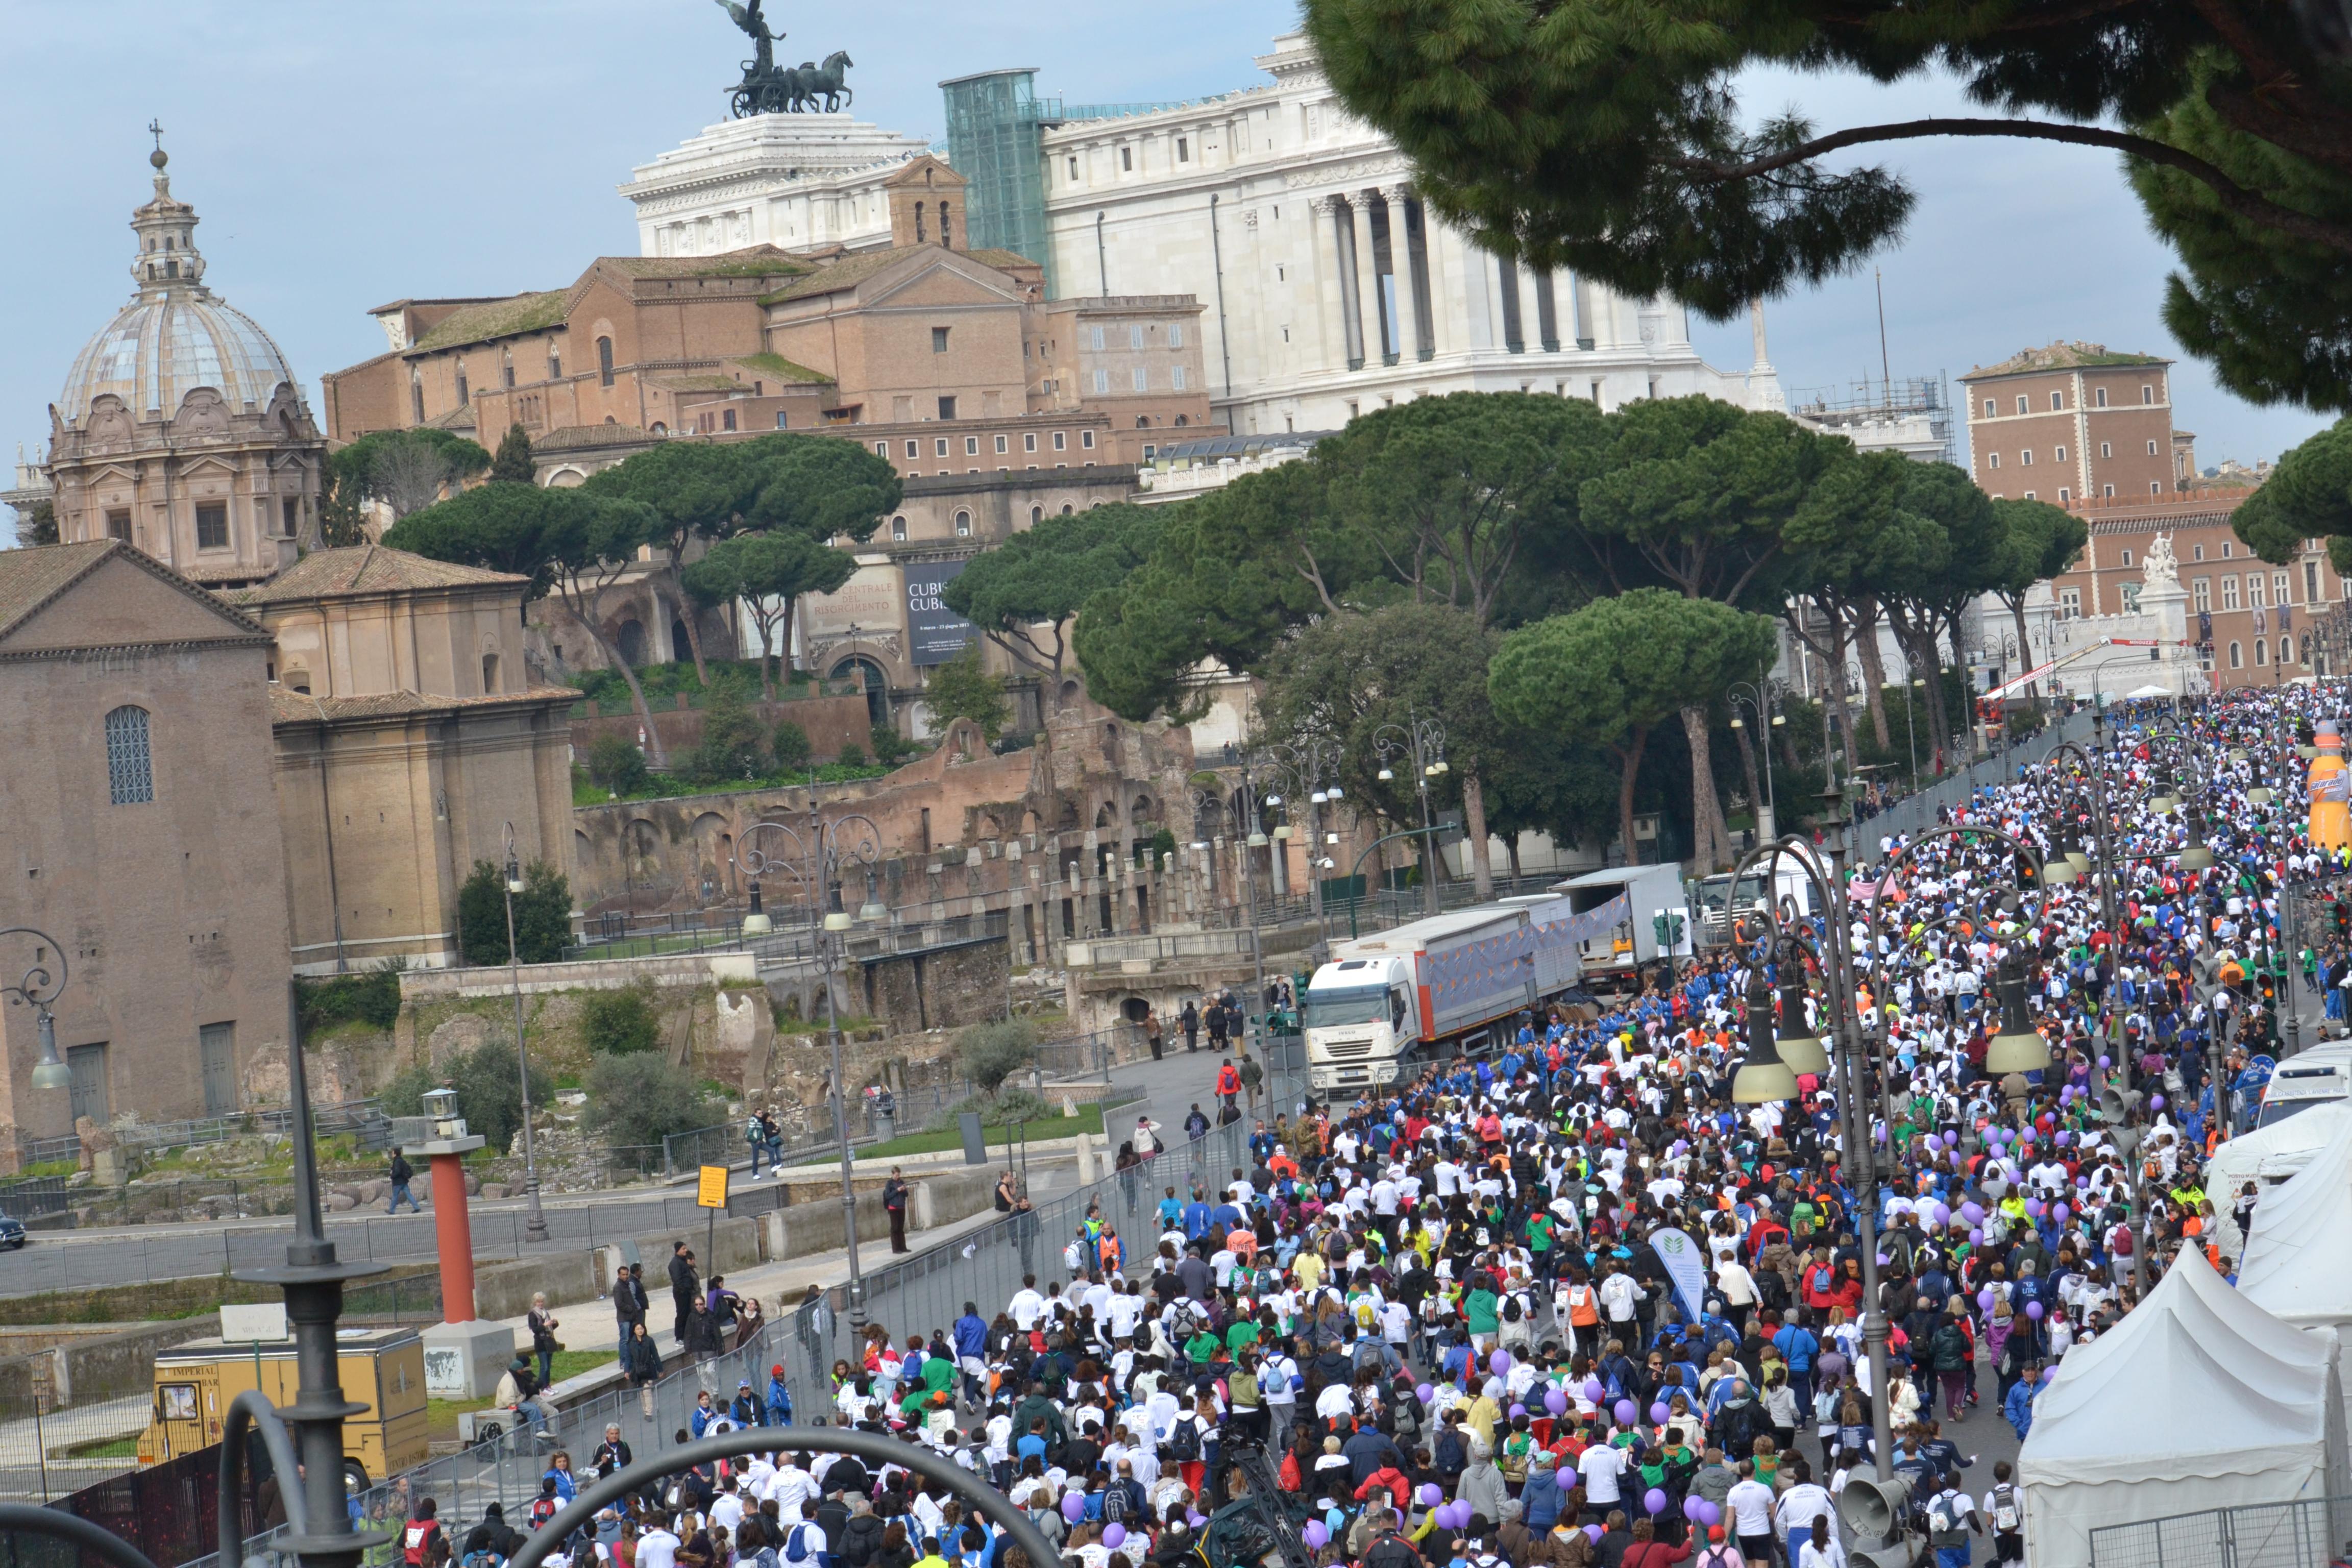 maratona-di-roma-2013-447